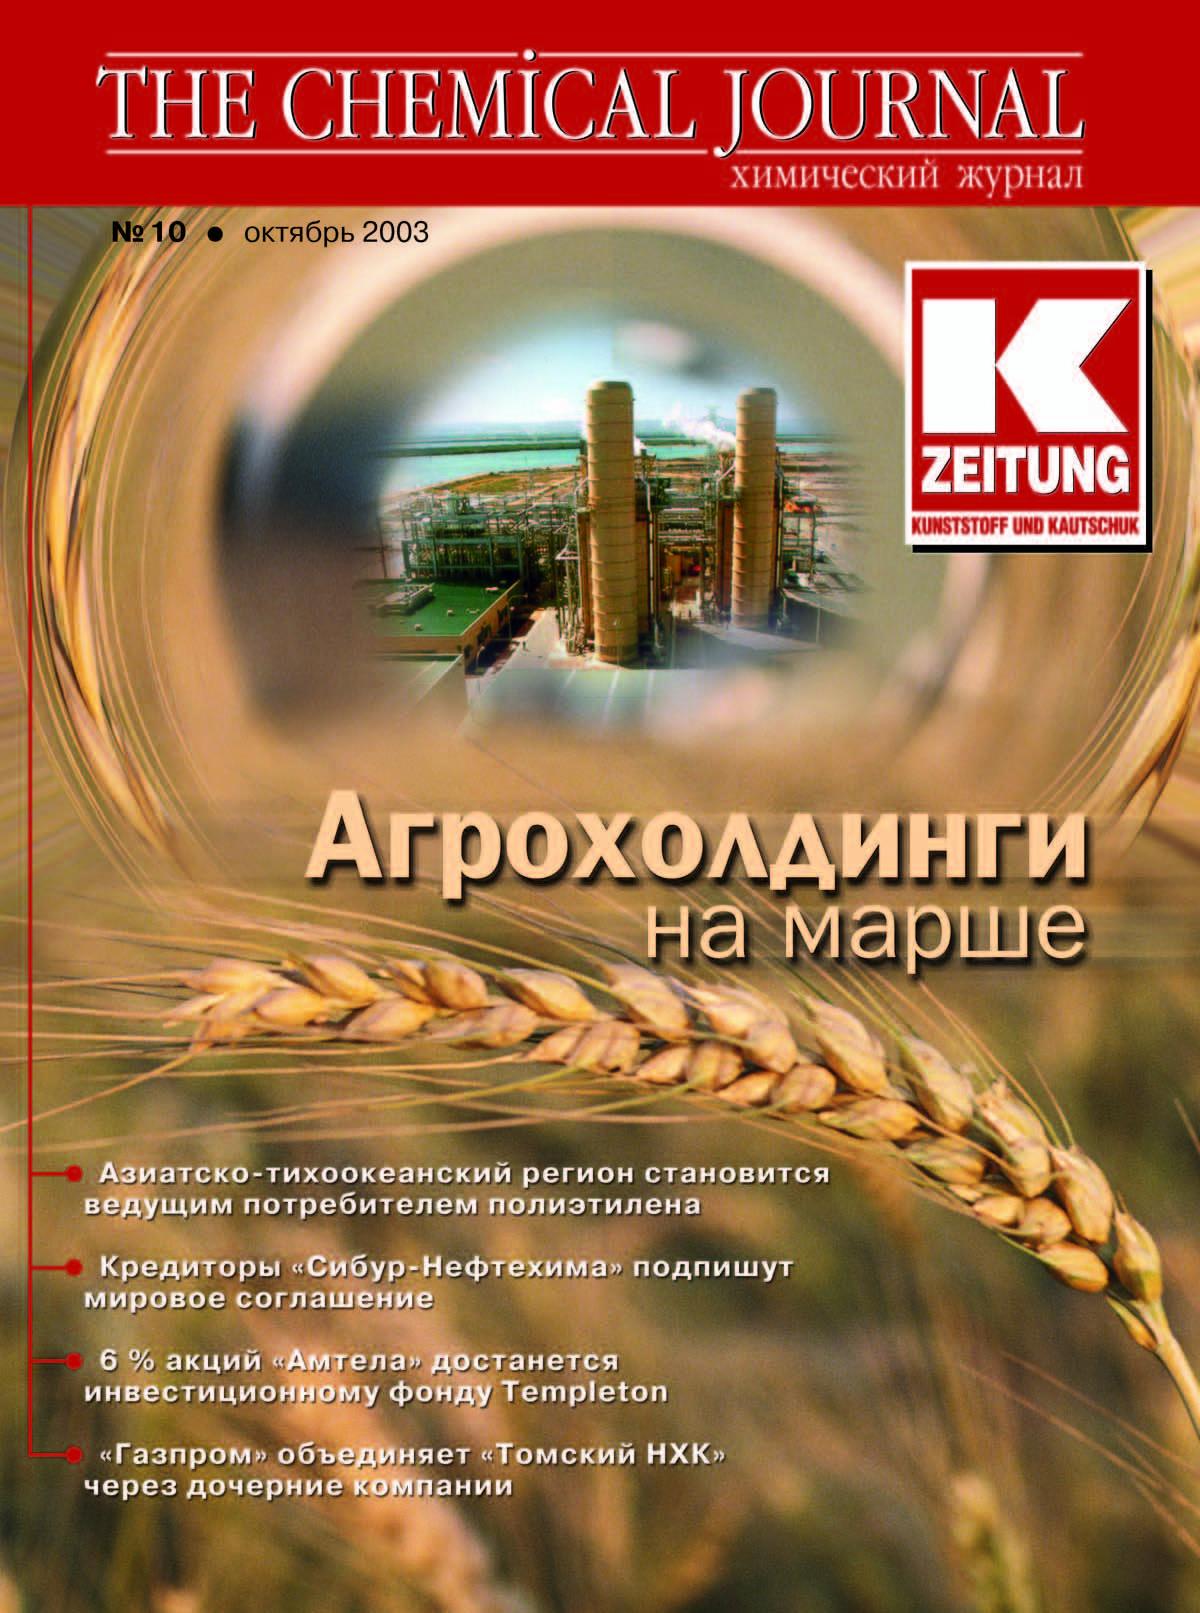 Октябрь 2003 | Выпуск